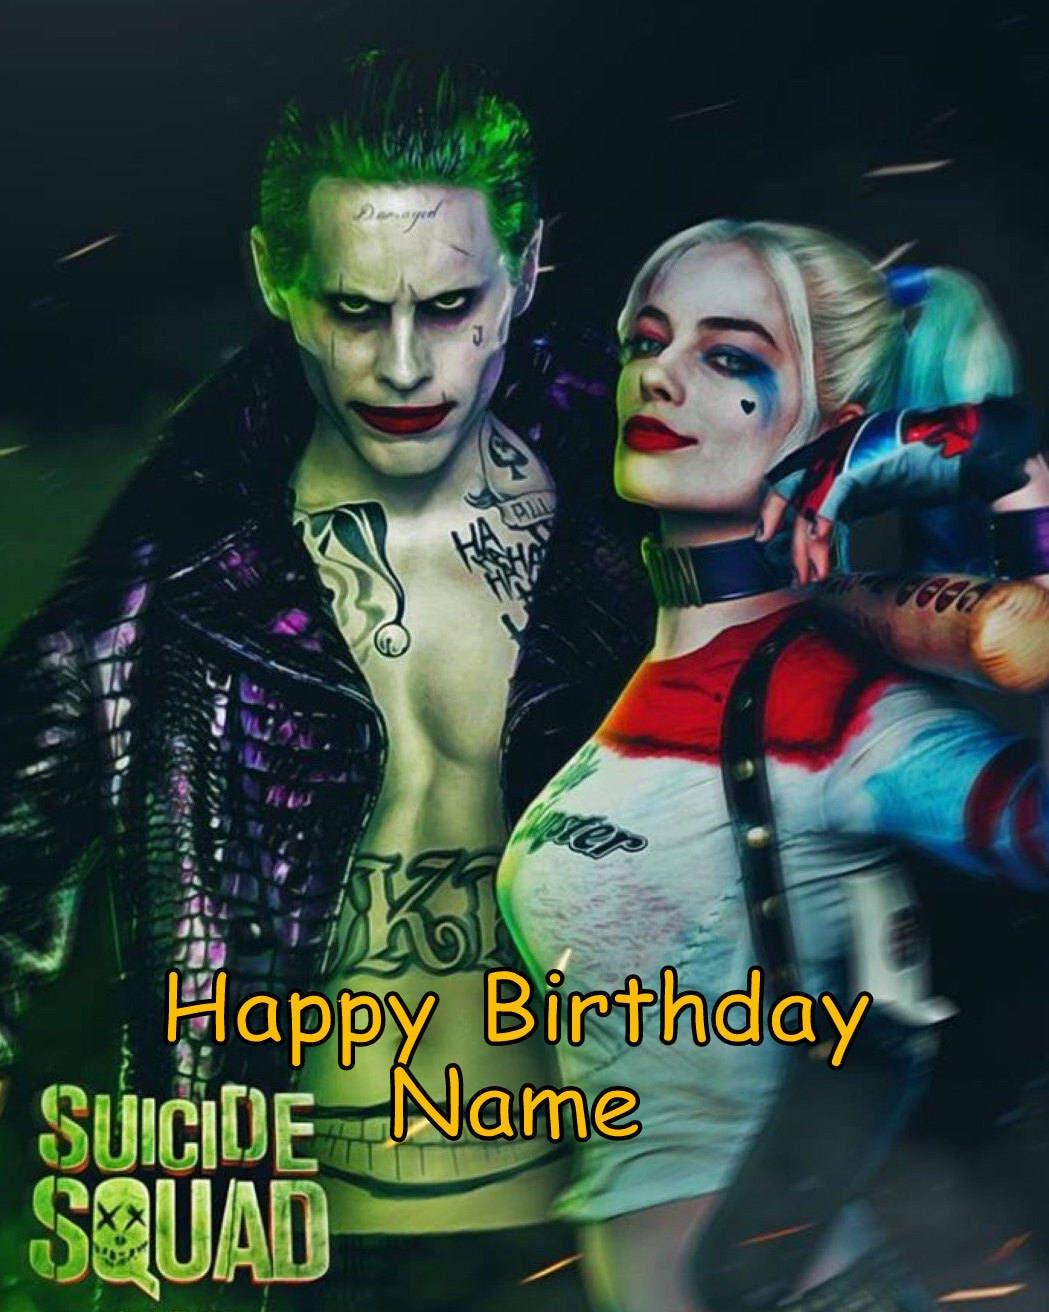 Suicide Squad Harley Quinn Joker Edible Image Cake Topper